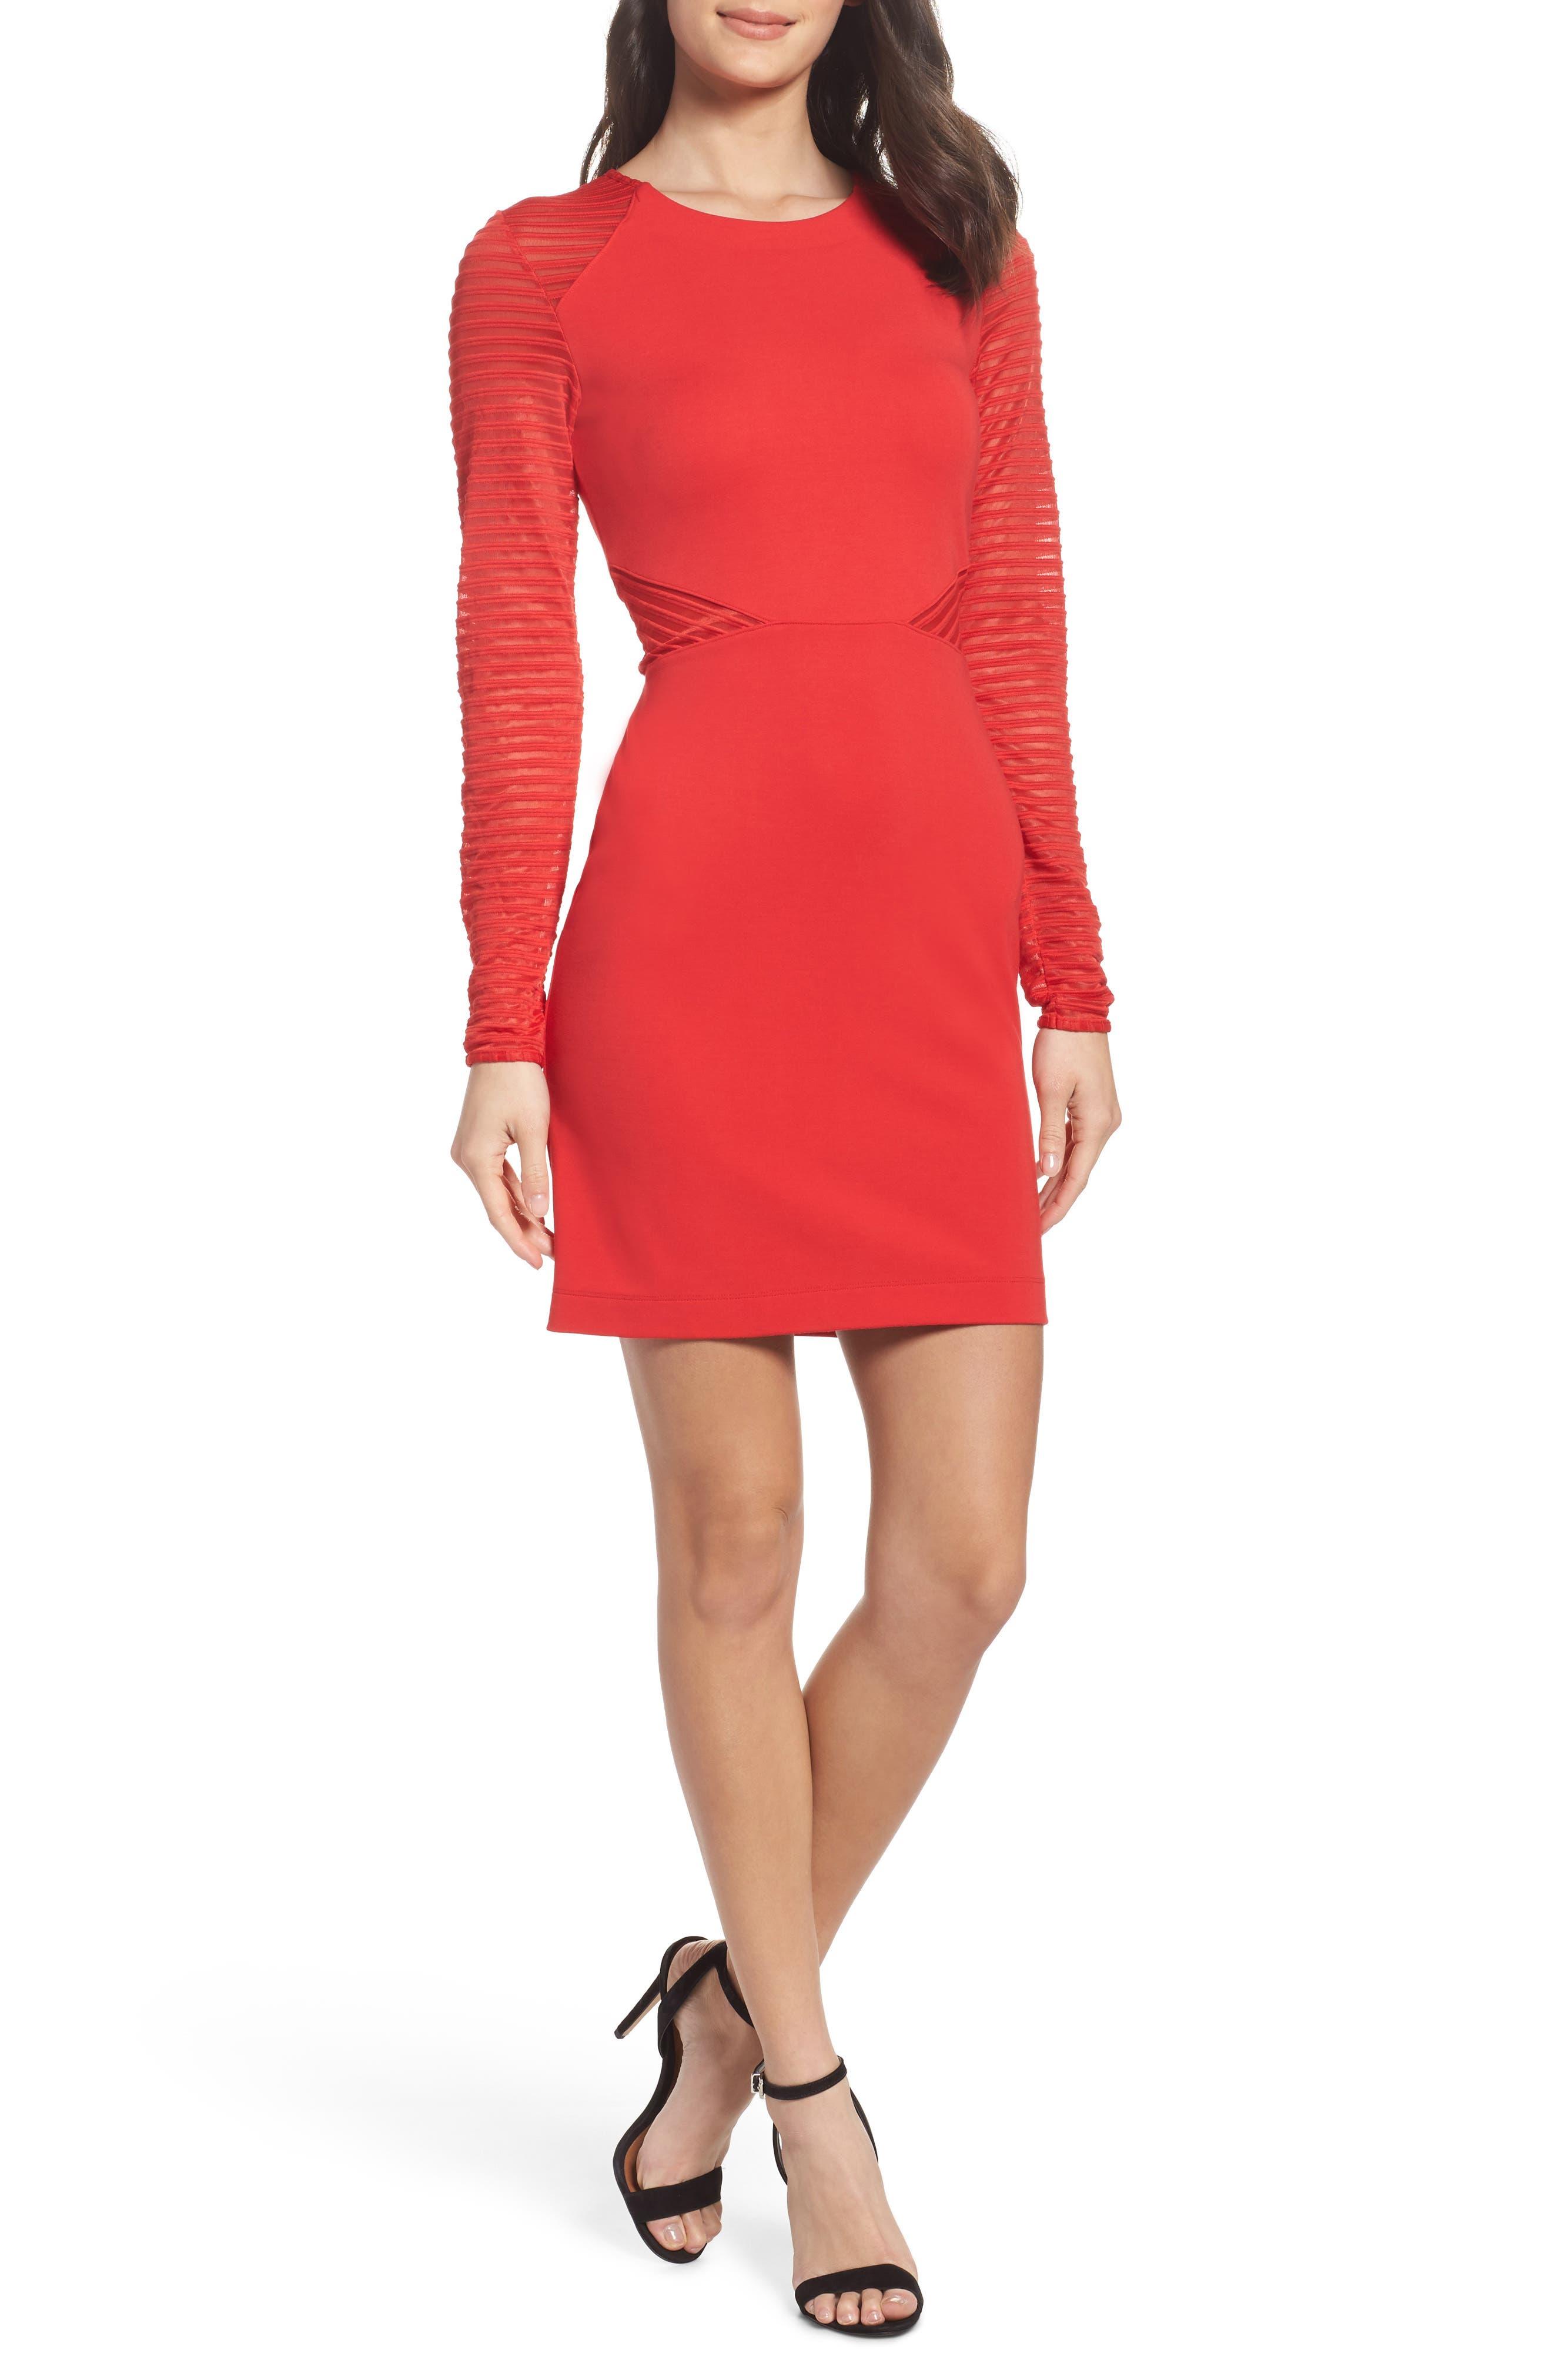 Thiestis Body-Con Dress,                             Main thumbnail 2, color,